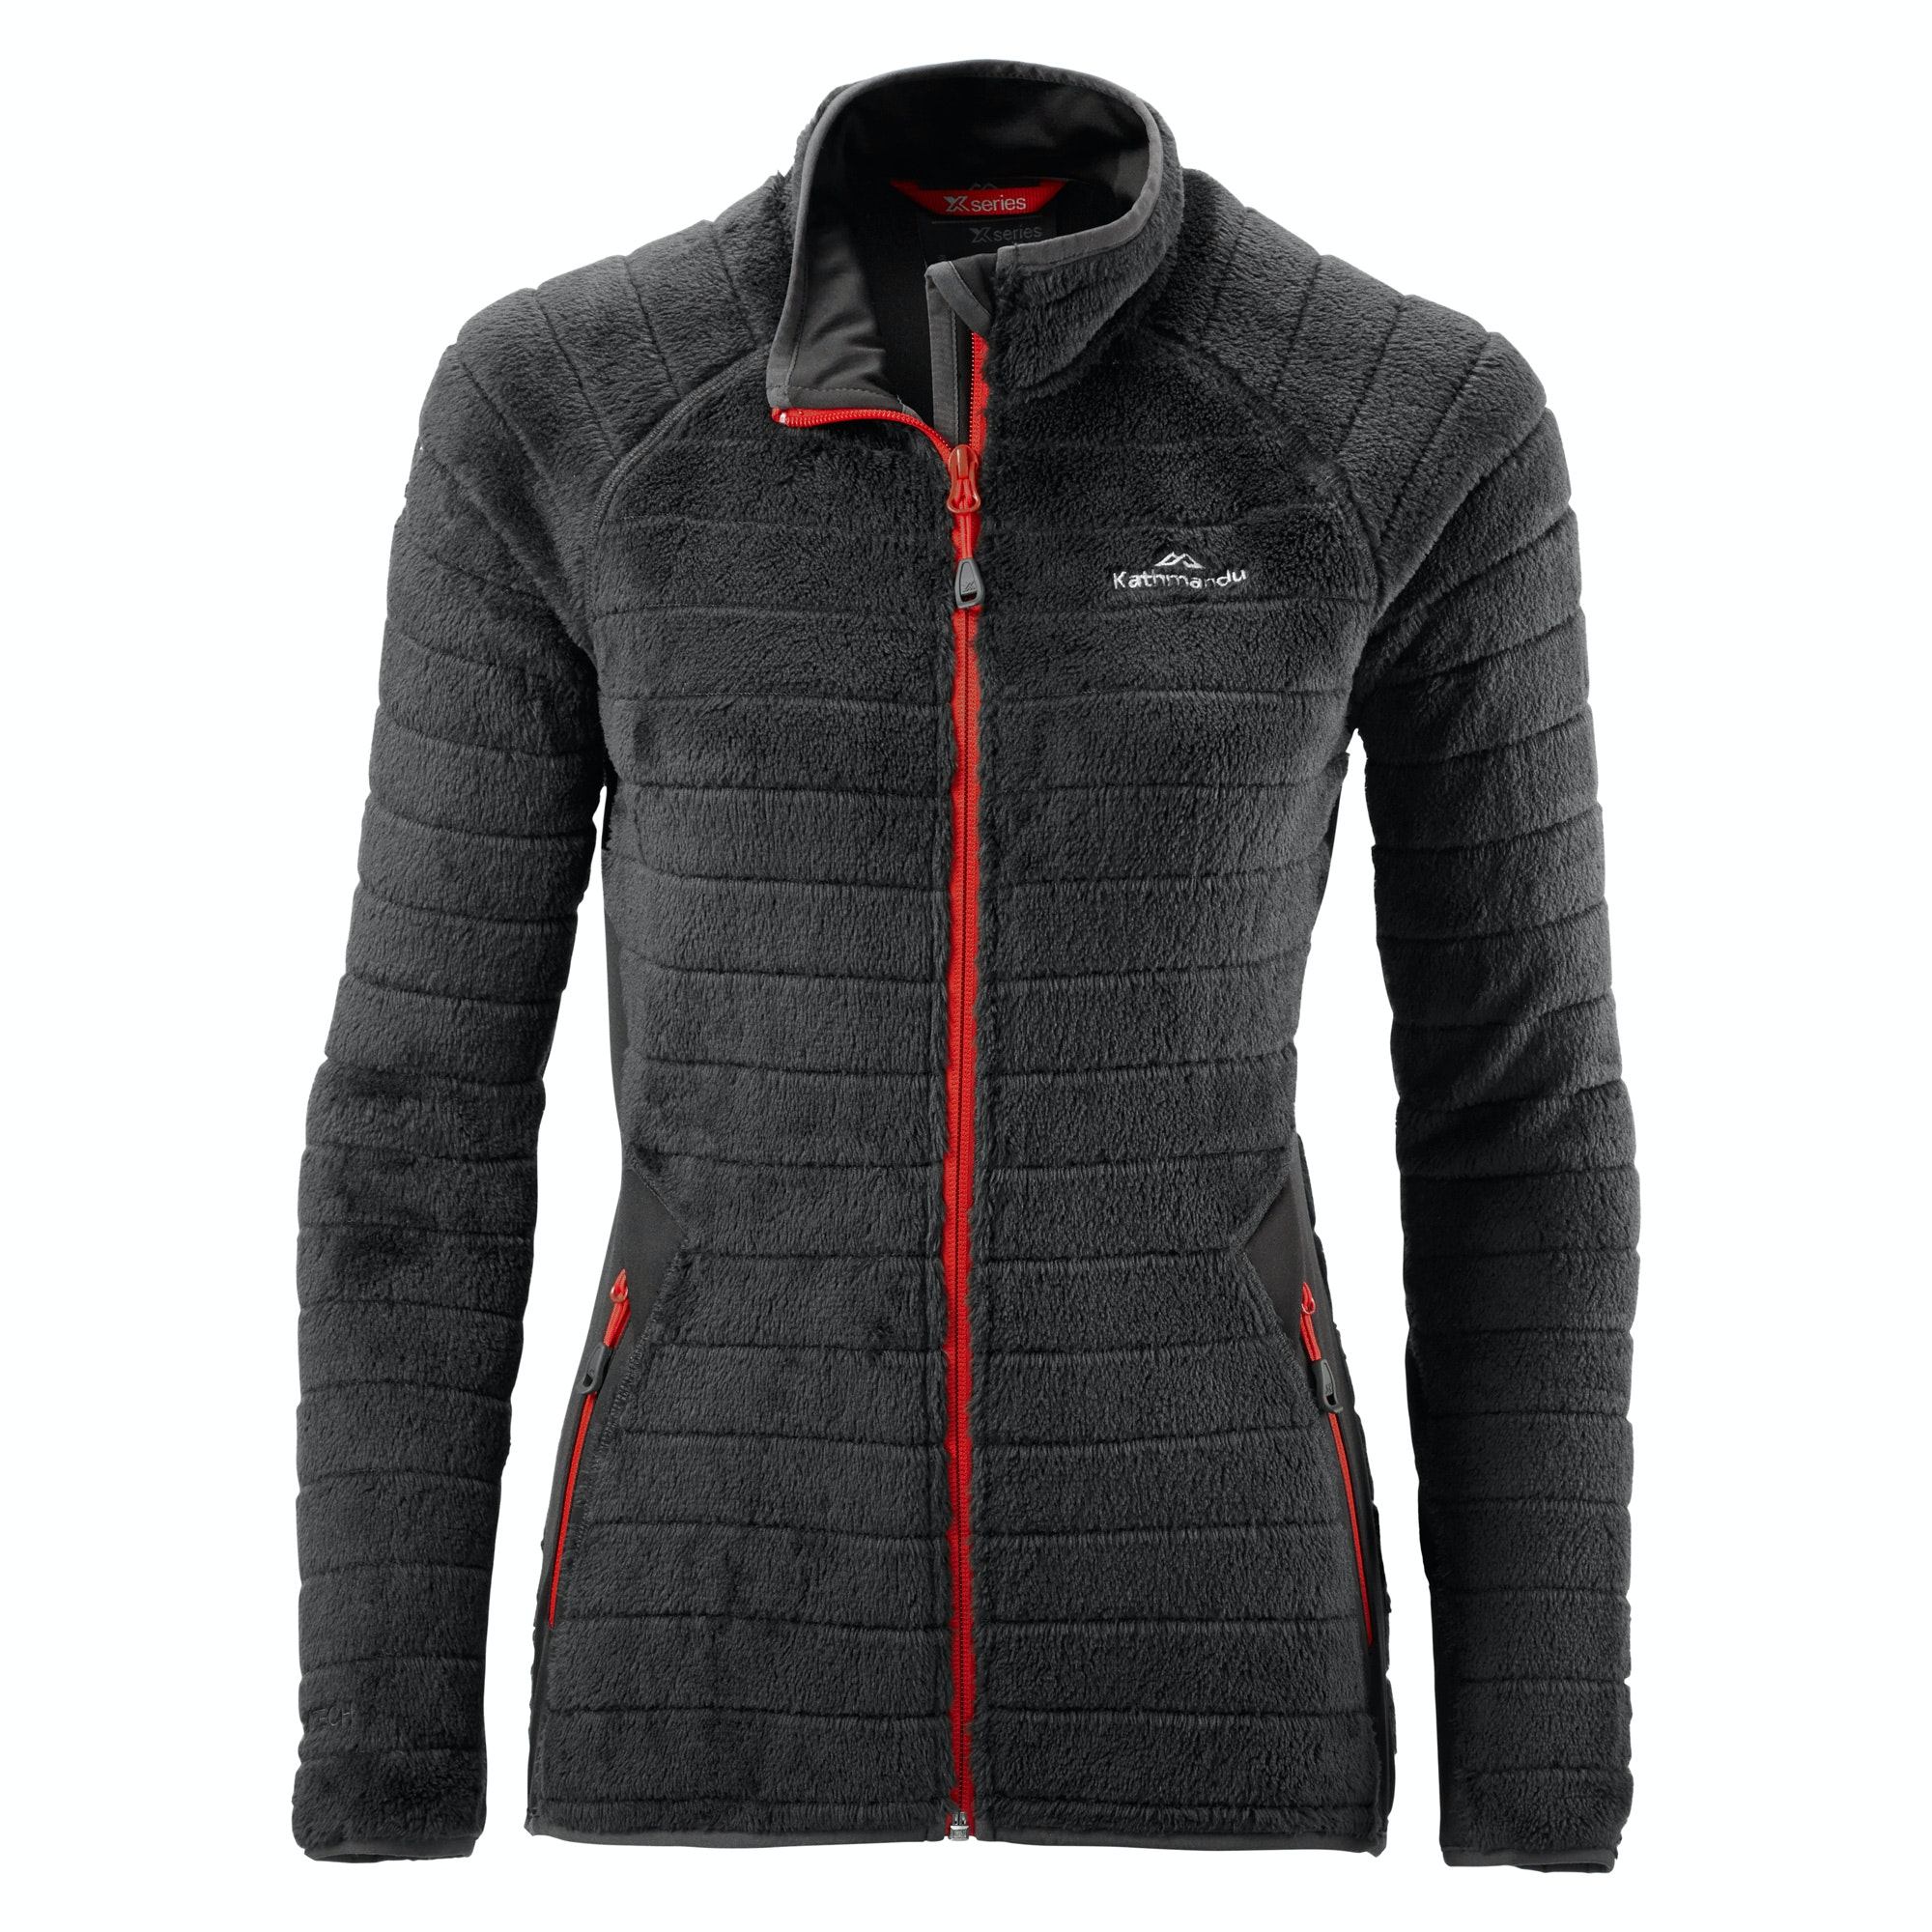 View more of the XT Asperous Women's Fleece Jacket